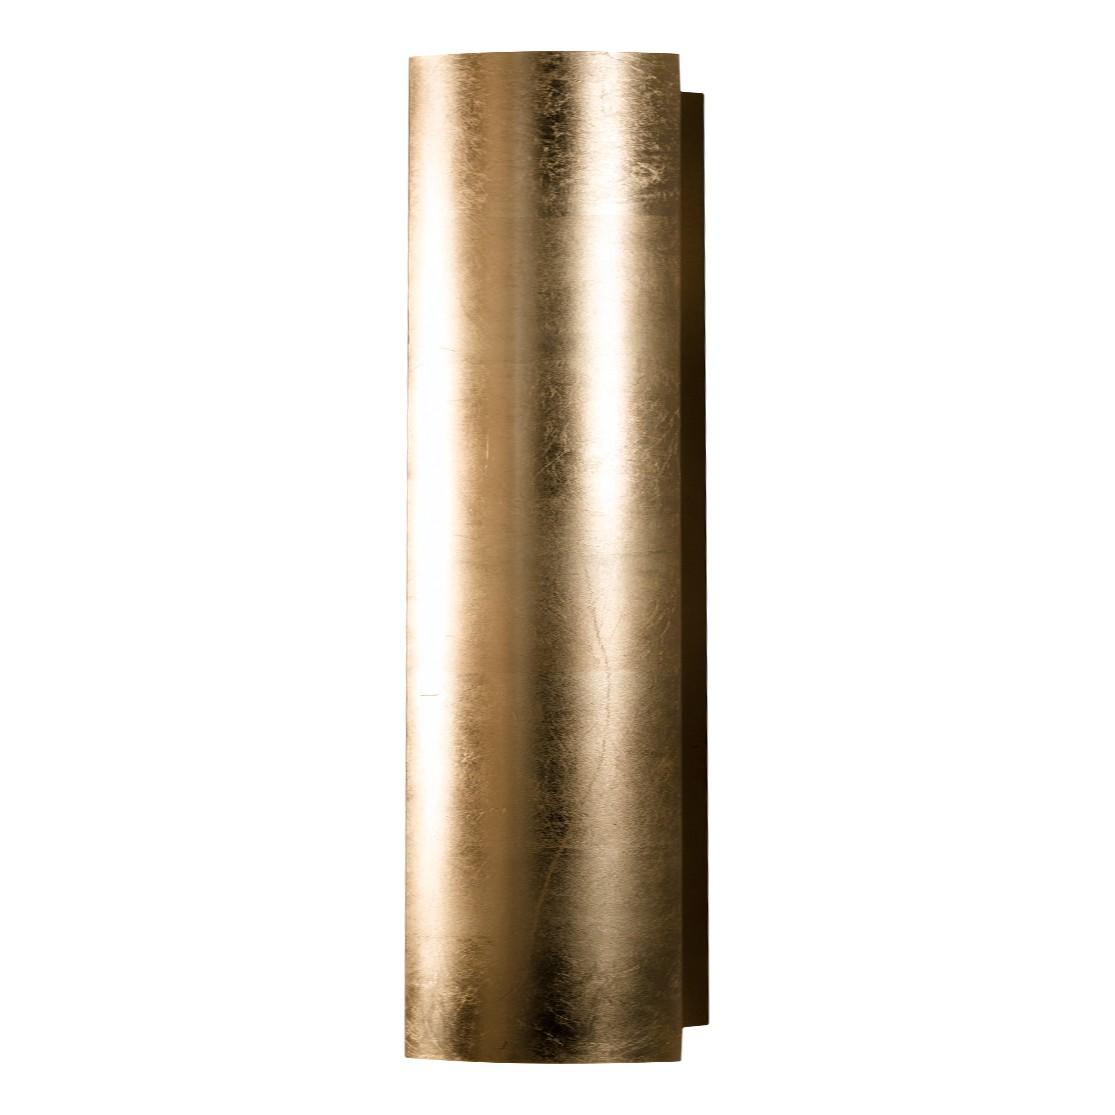 EEK A, Wandleuchte Capsula 25 cm - Metall - Gold - 2-flammig, Hans Kögl